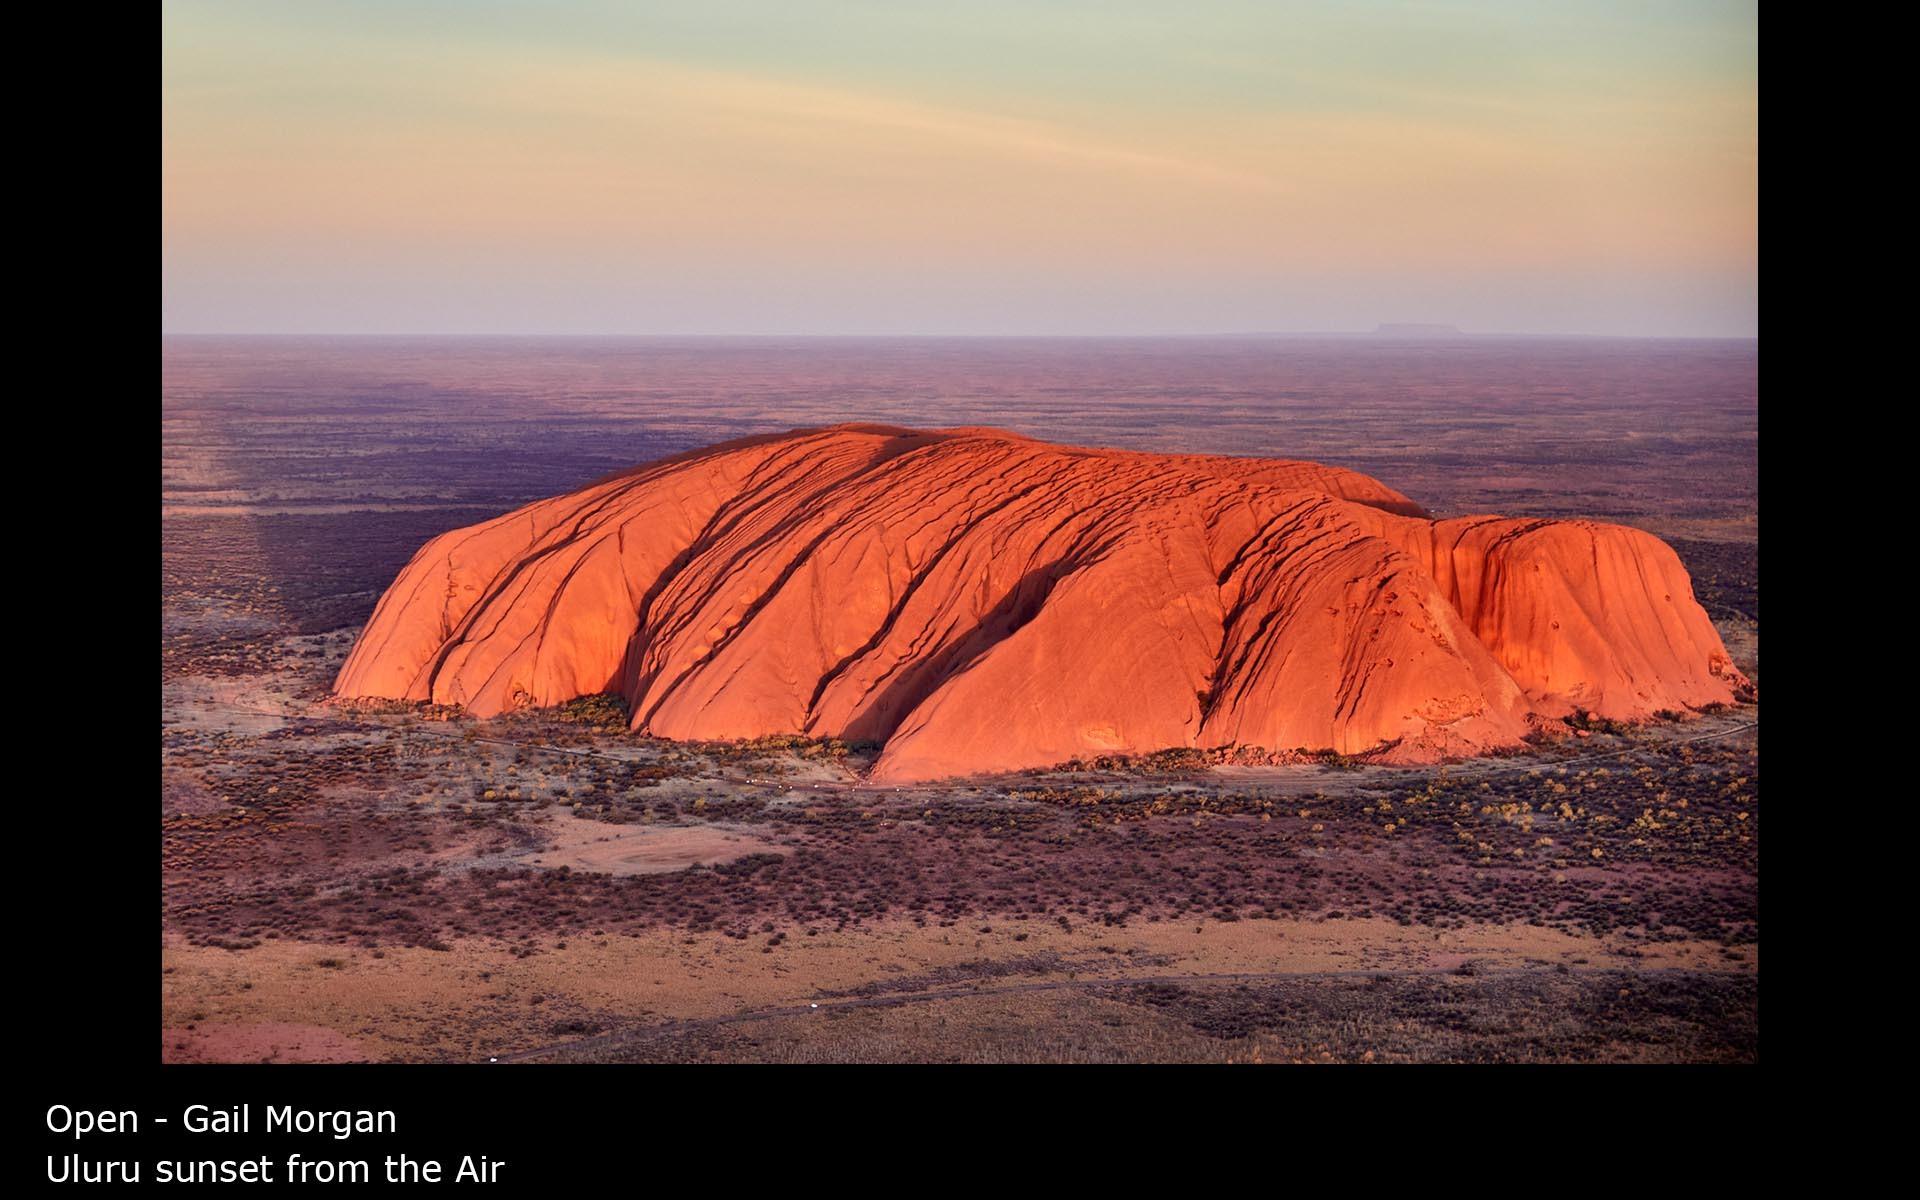 Uluru sunset from the Air - Gail Morgan